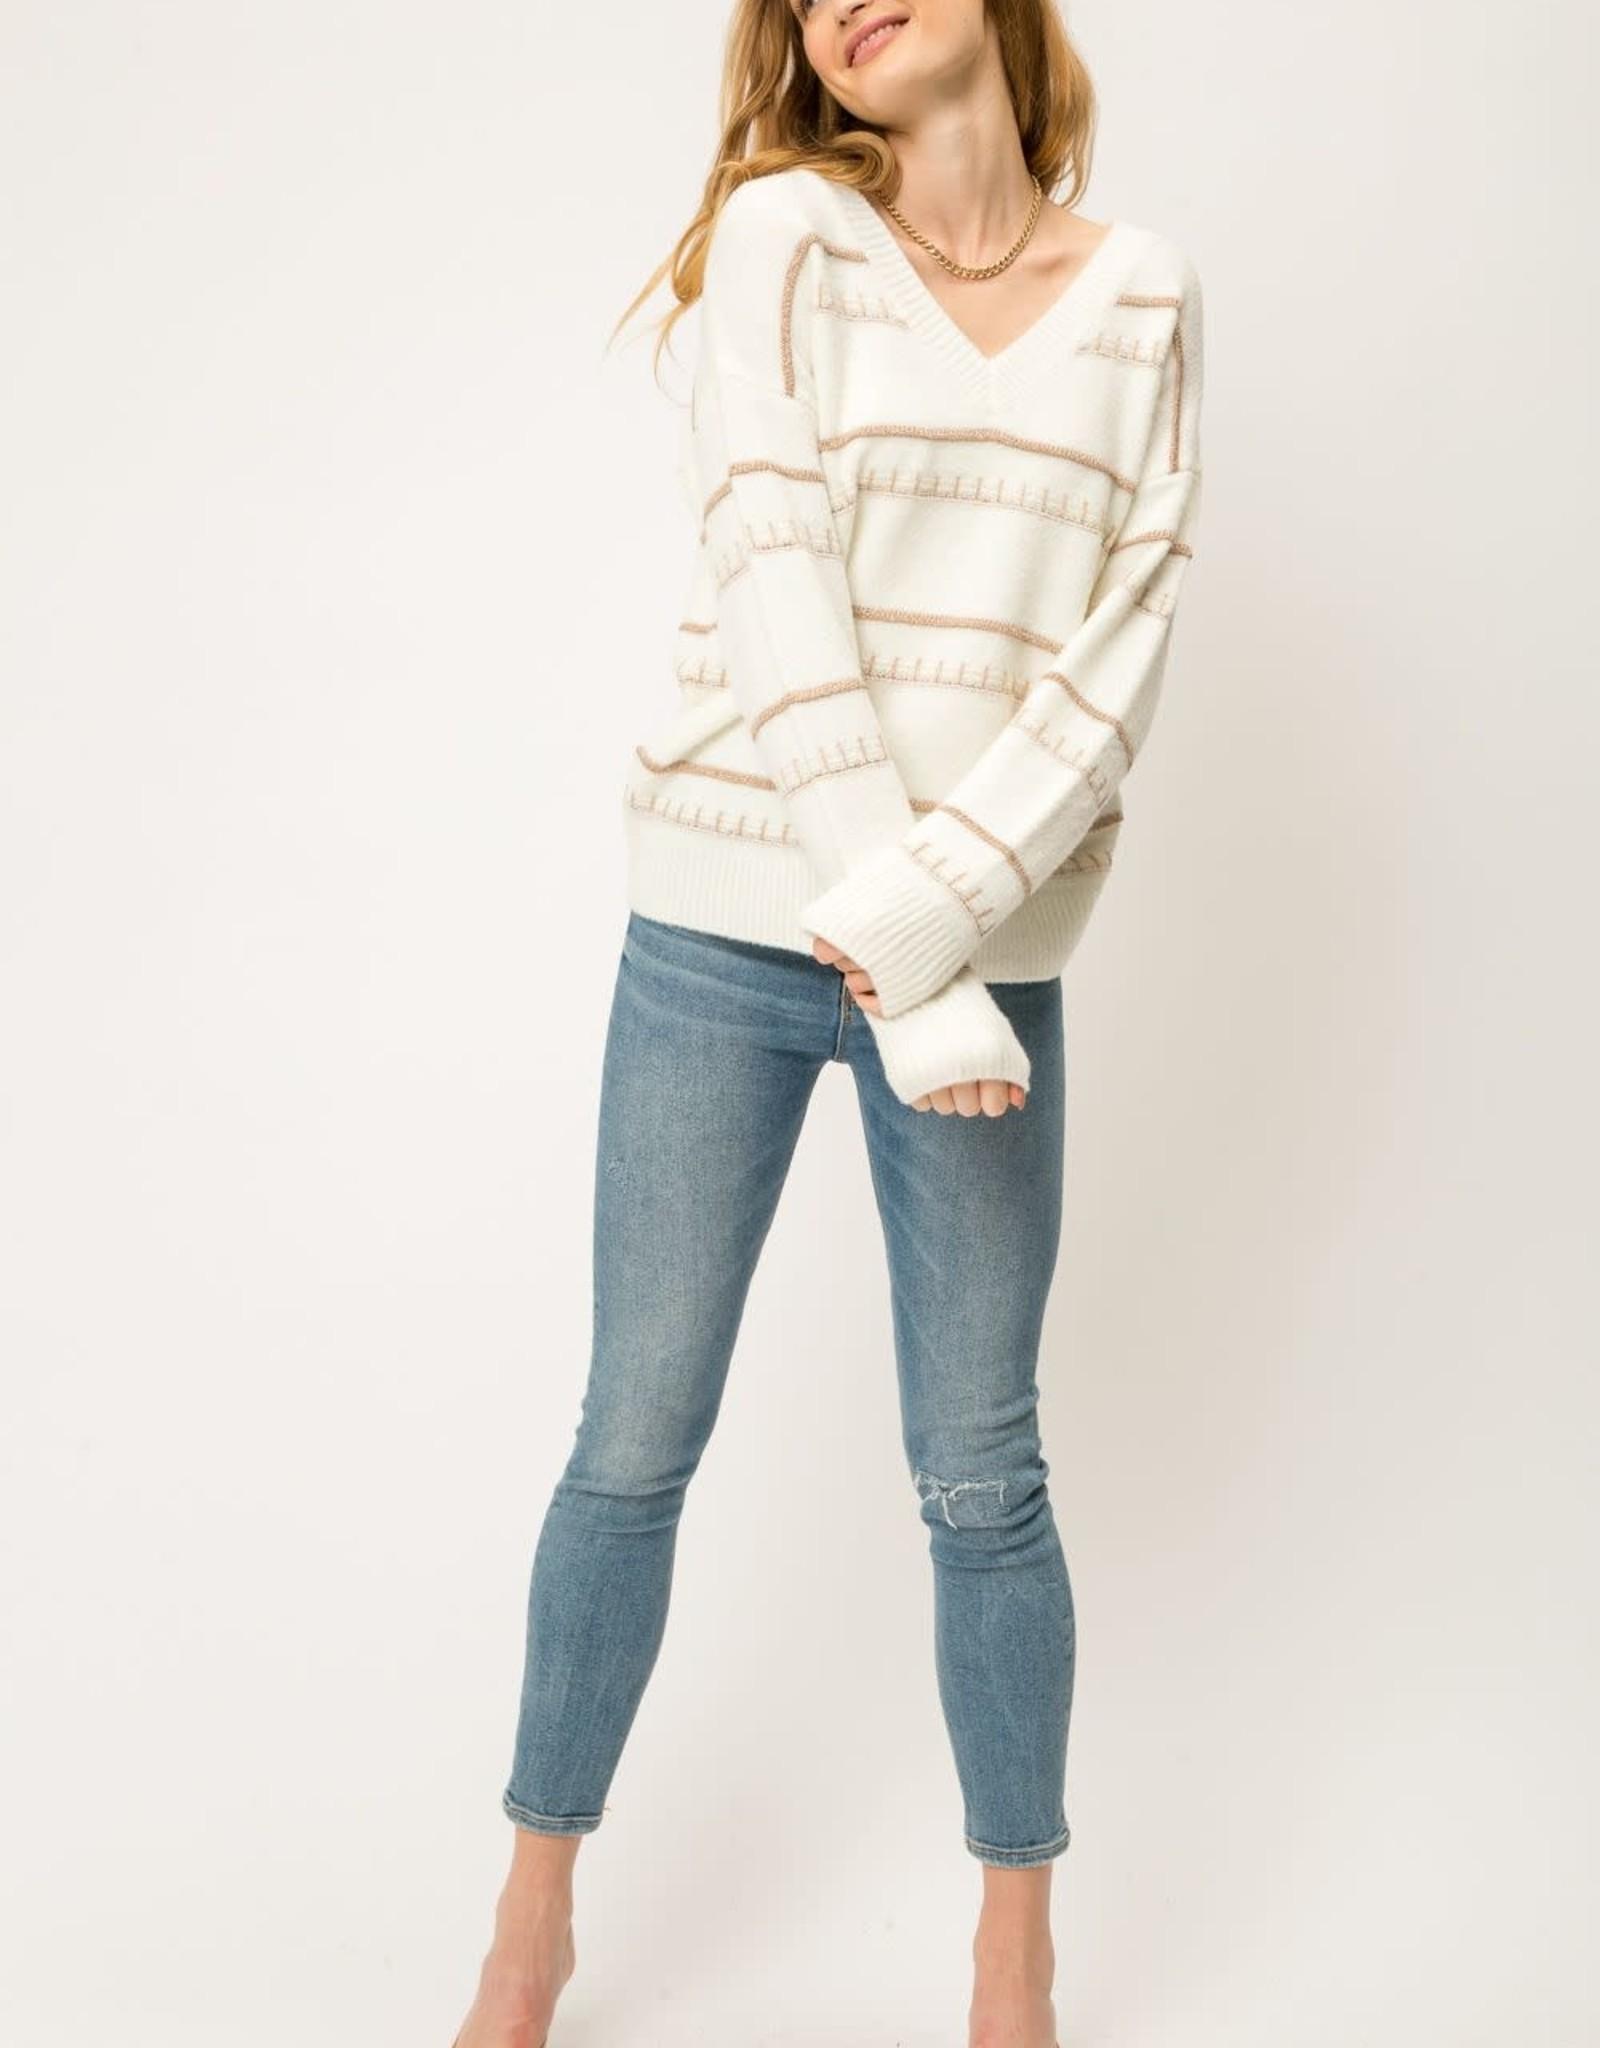 Ivory lurex sweater